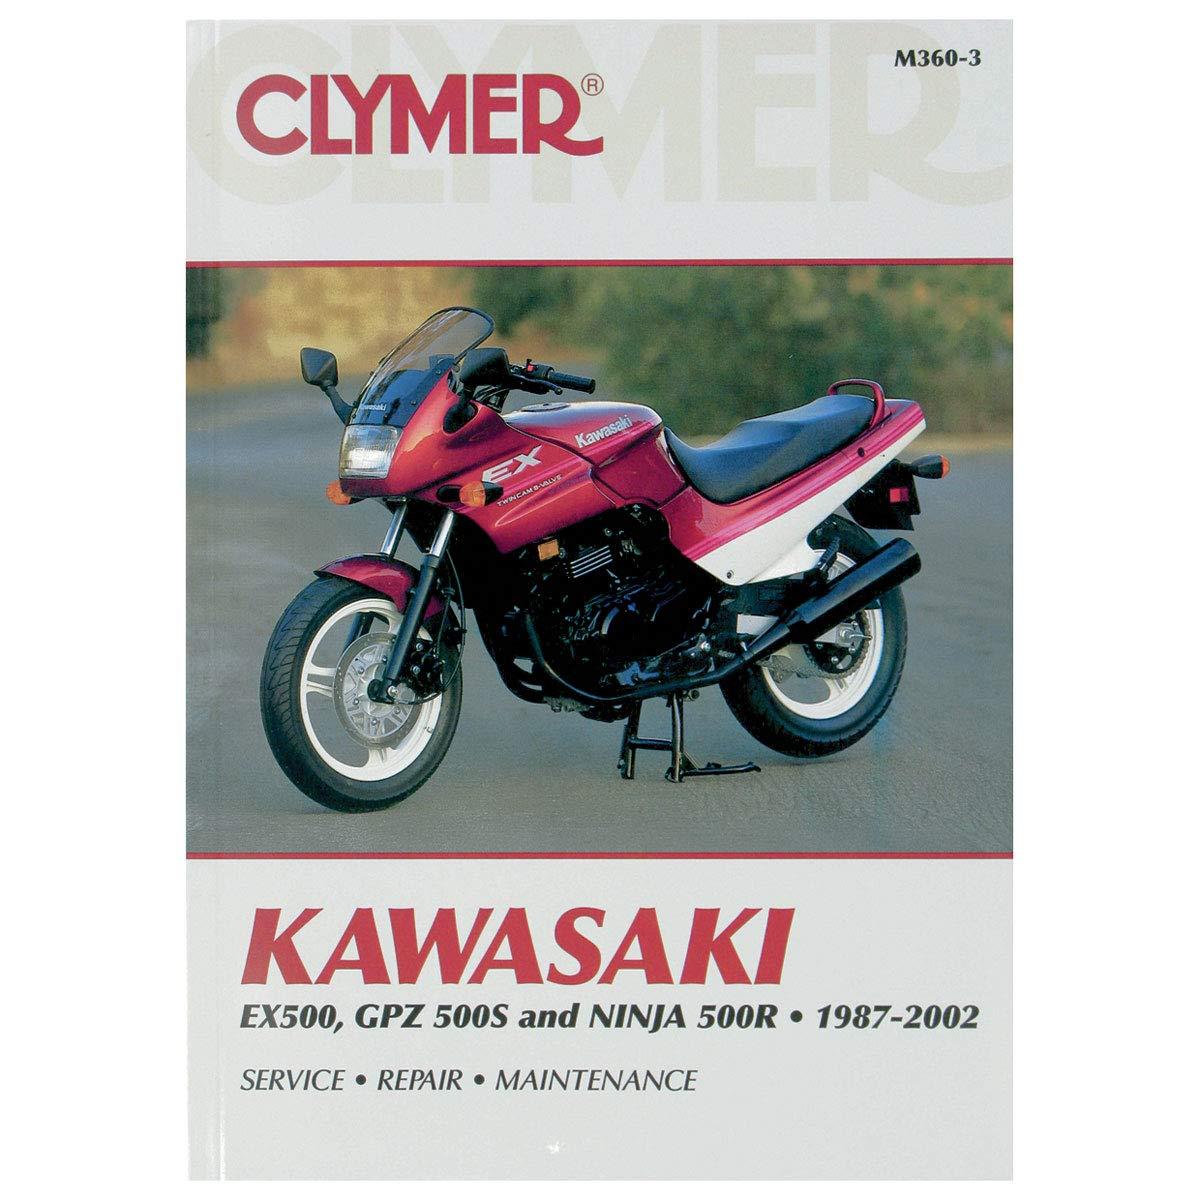 clymer repair manual for kawasaki ex500 gpz500s 500r 87 02